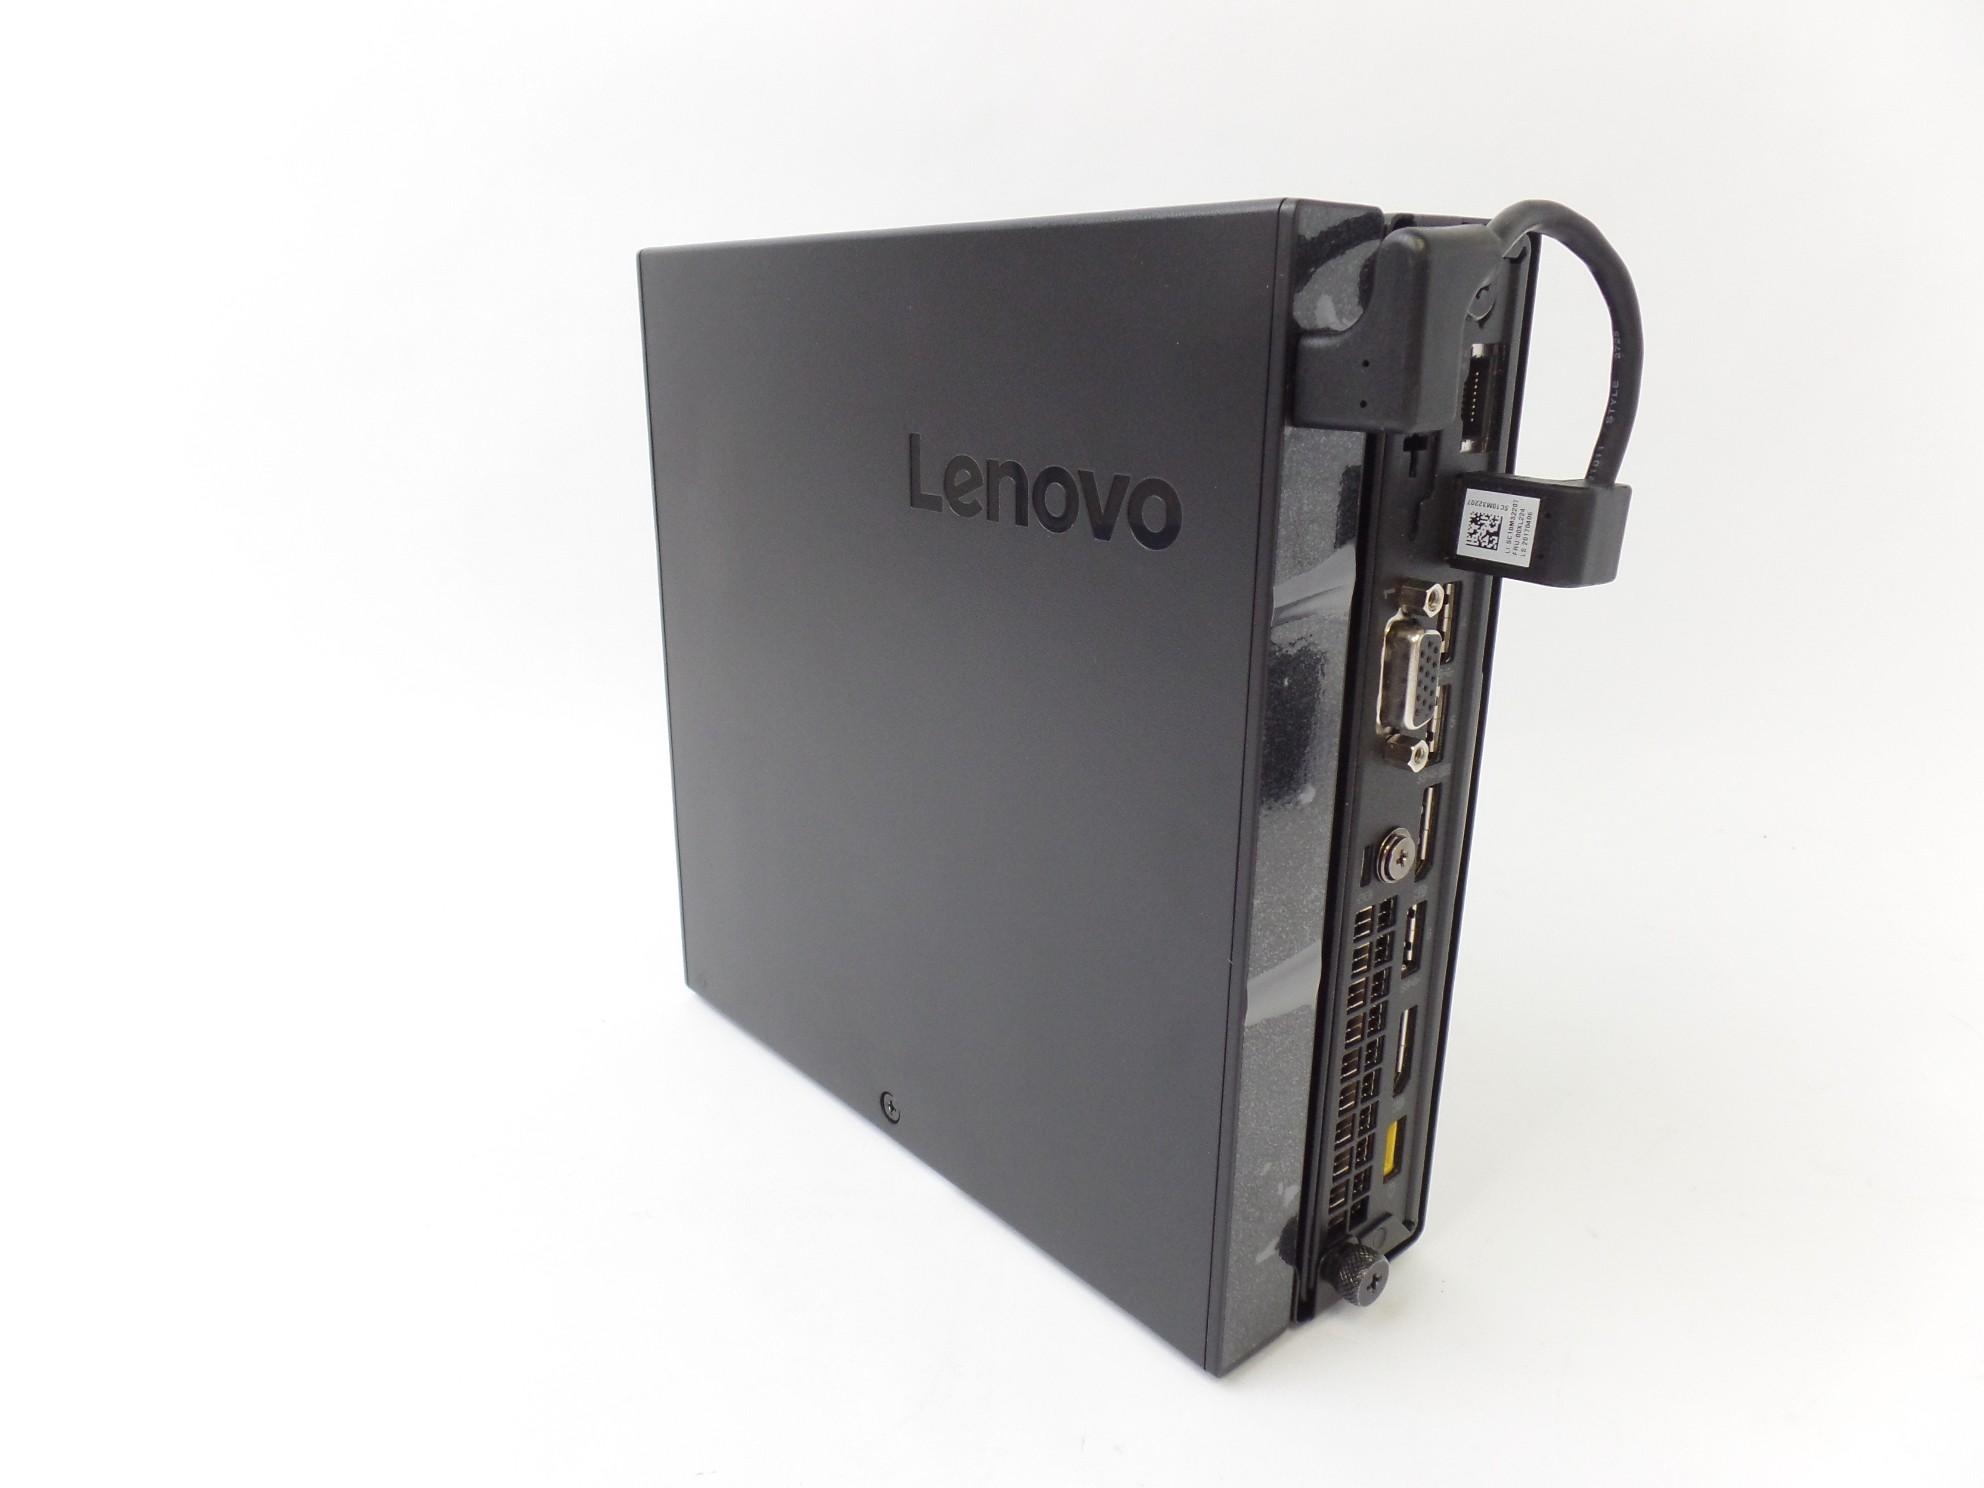 Lenovo ThinkCentre M910q Tiny Desktop PC Core i5-6500T 4GB 500GB W10P  10MUS0BV00